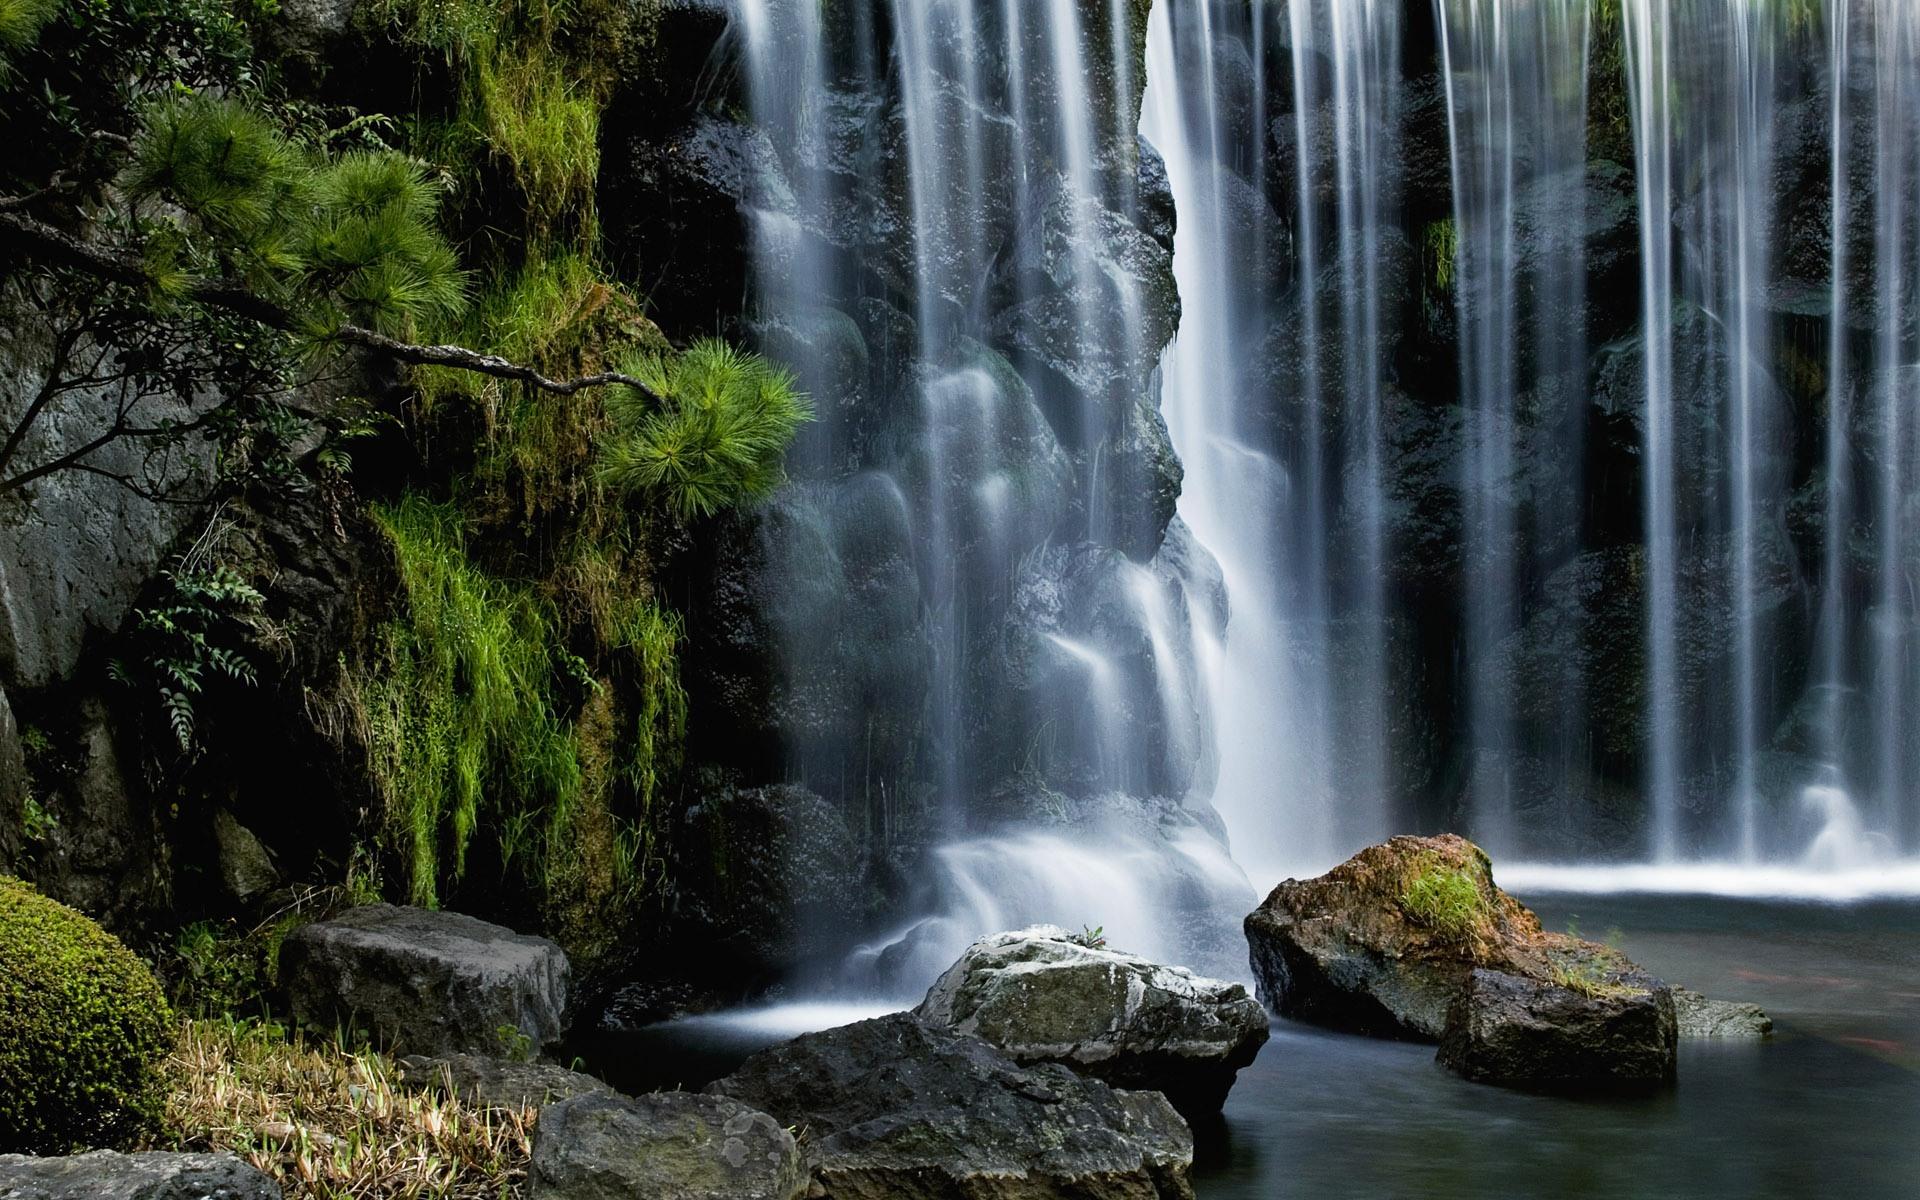 Japan Waterfall wallpaper   383454 1920x1200